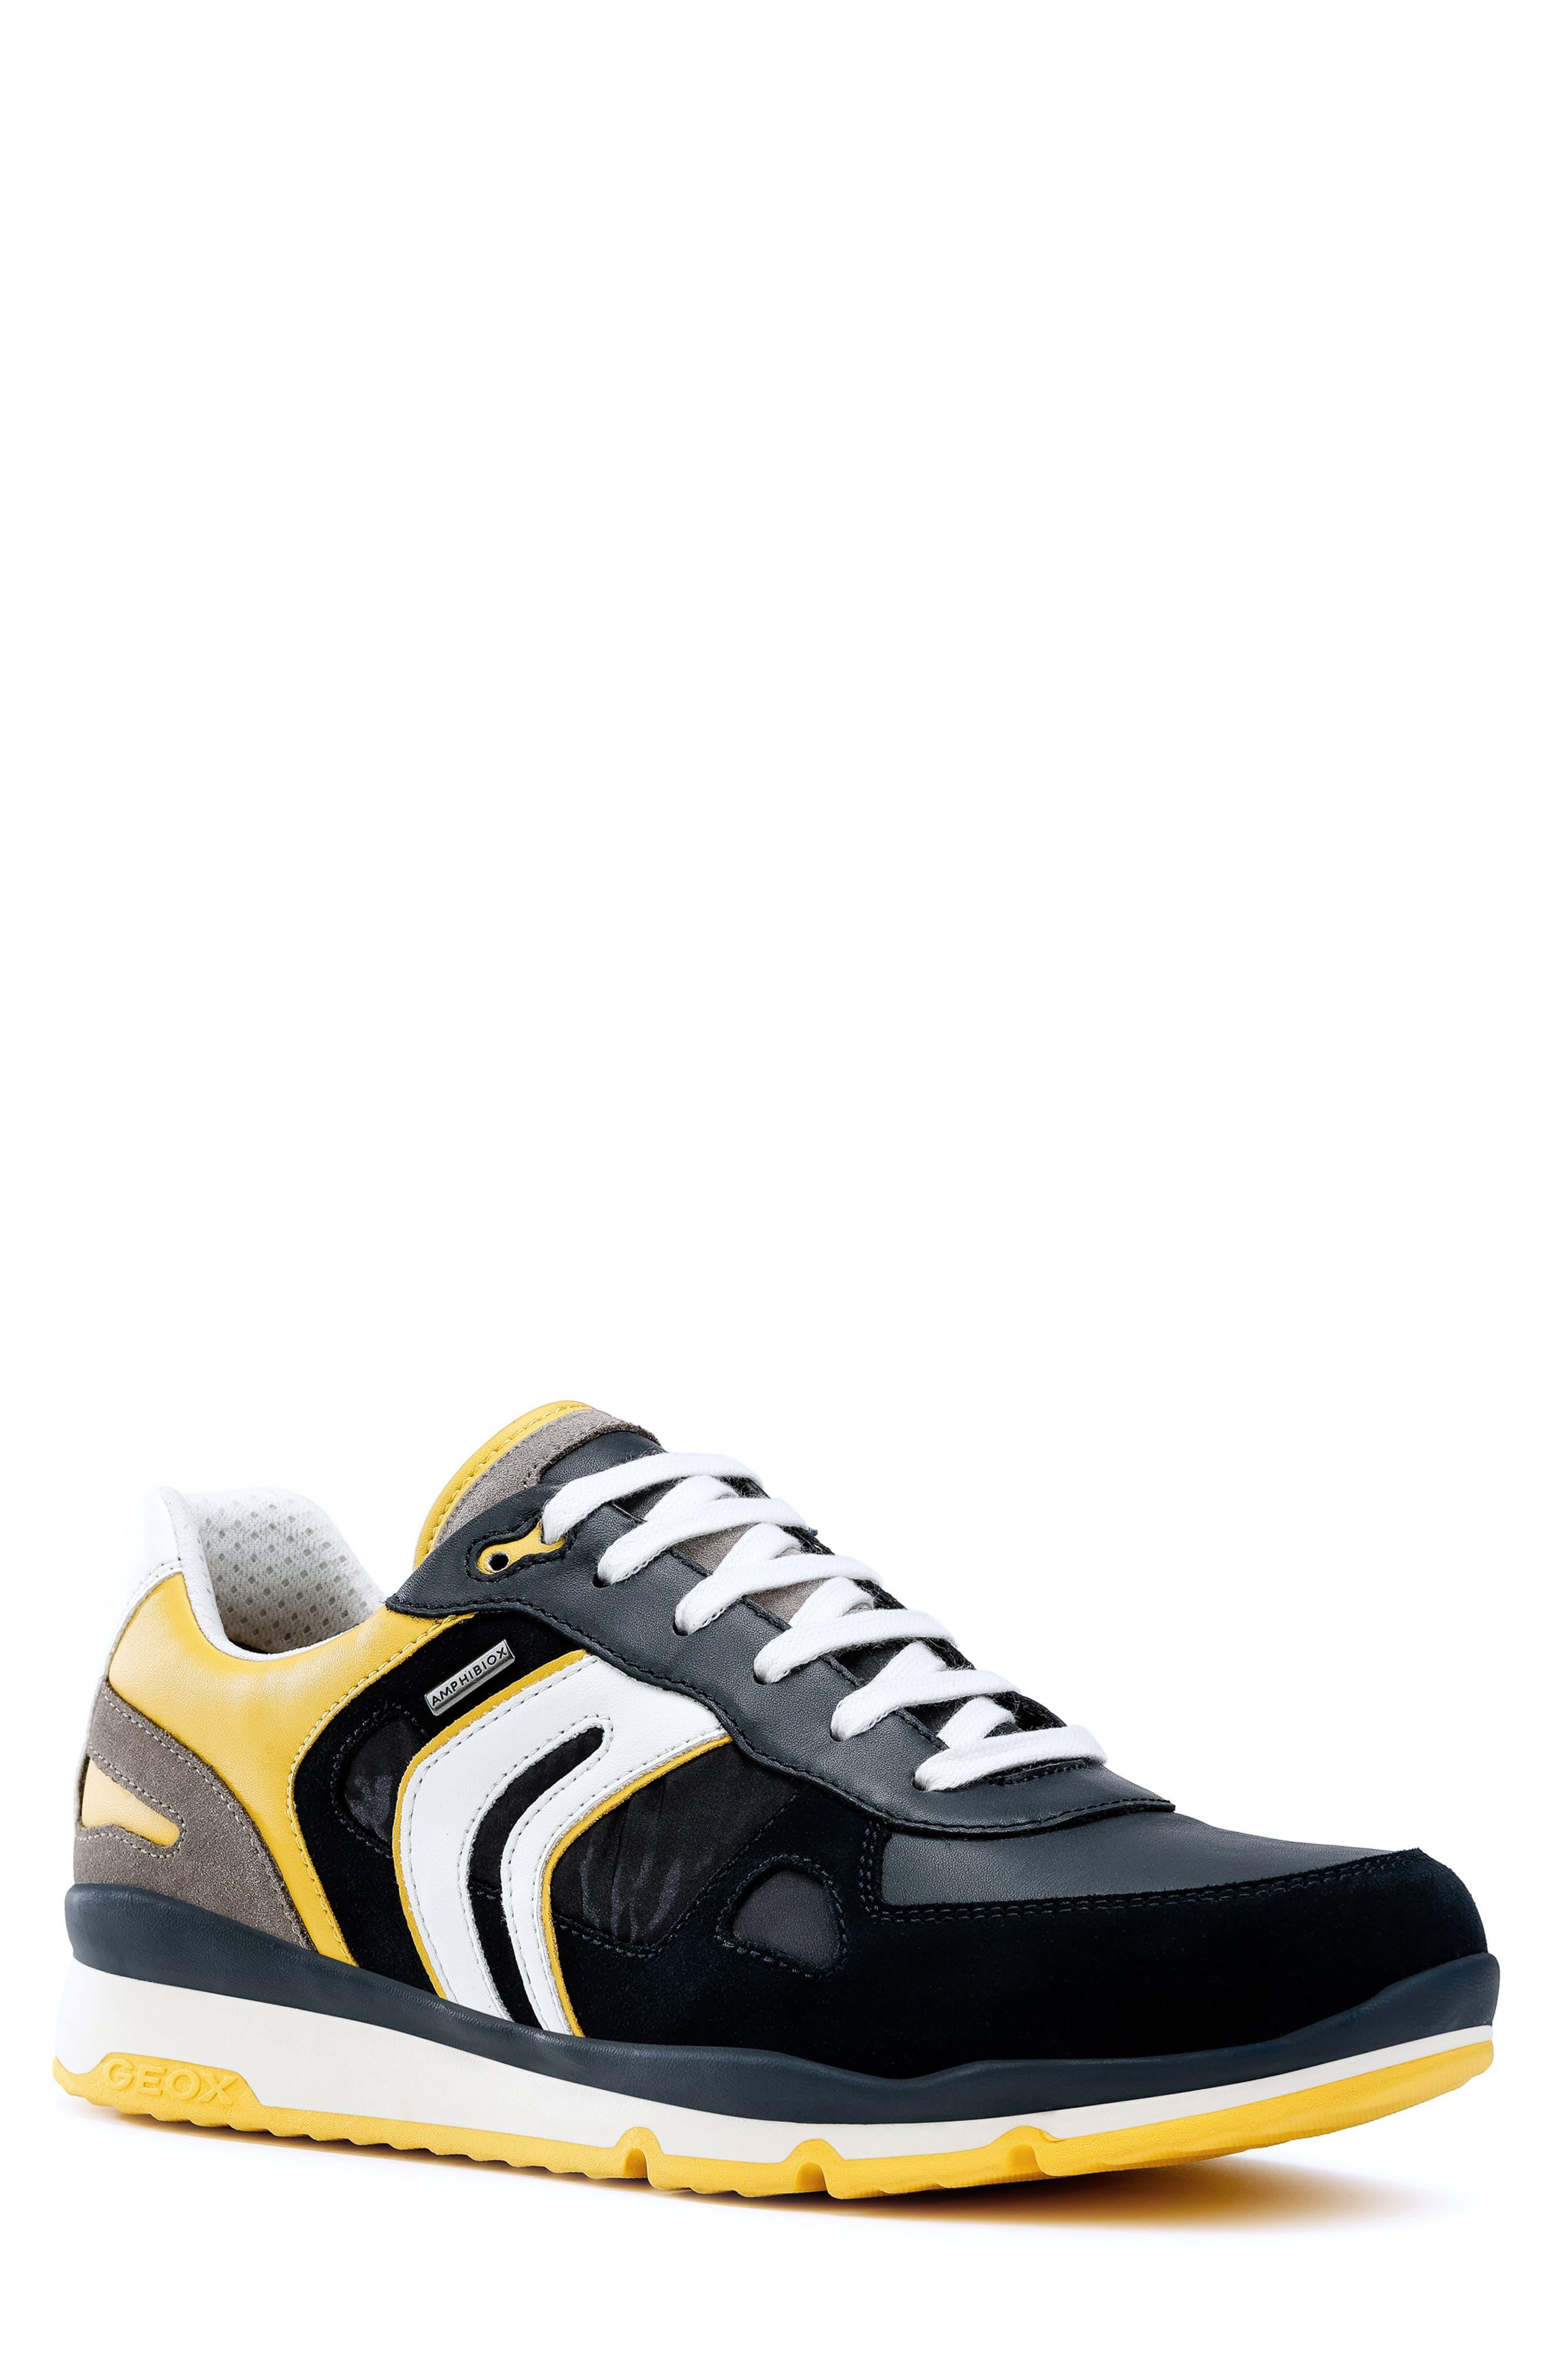 Geox Sandford Abx 2 Sneaker, Yellow